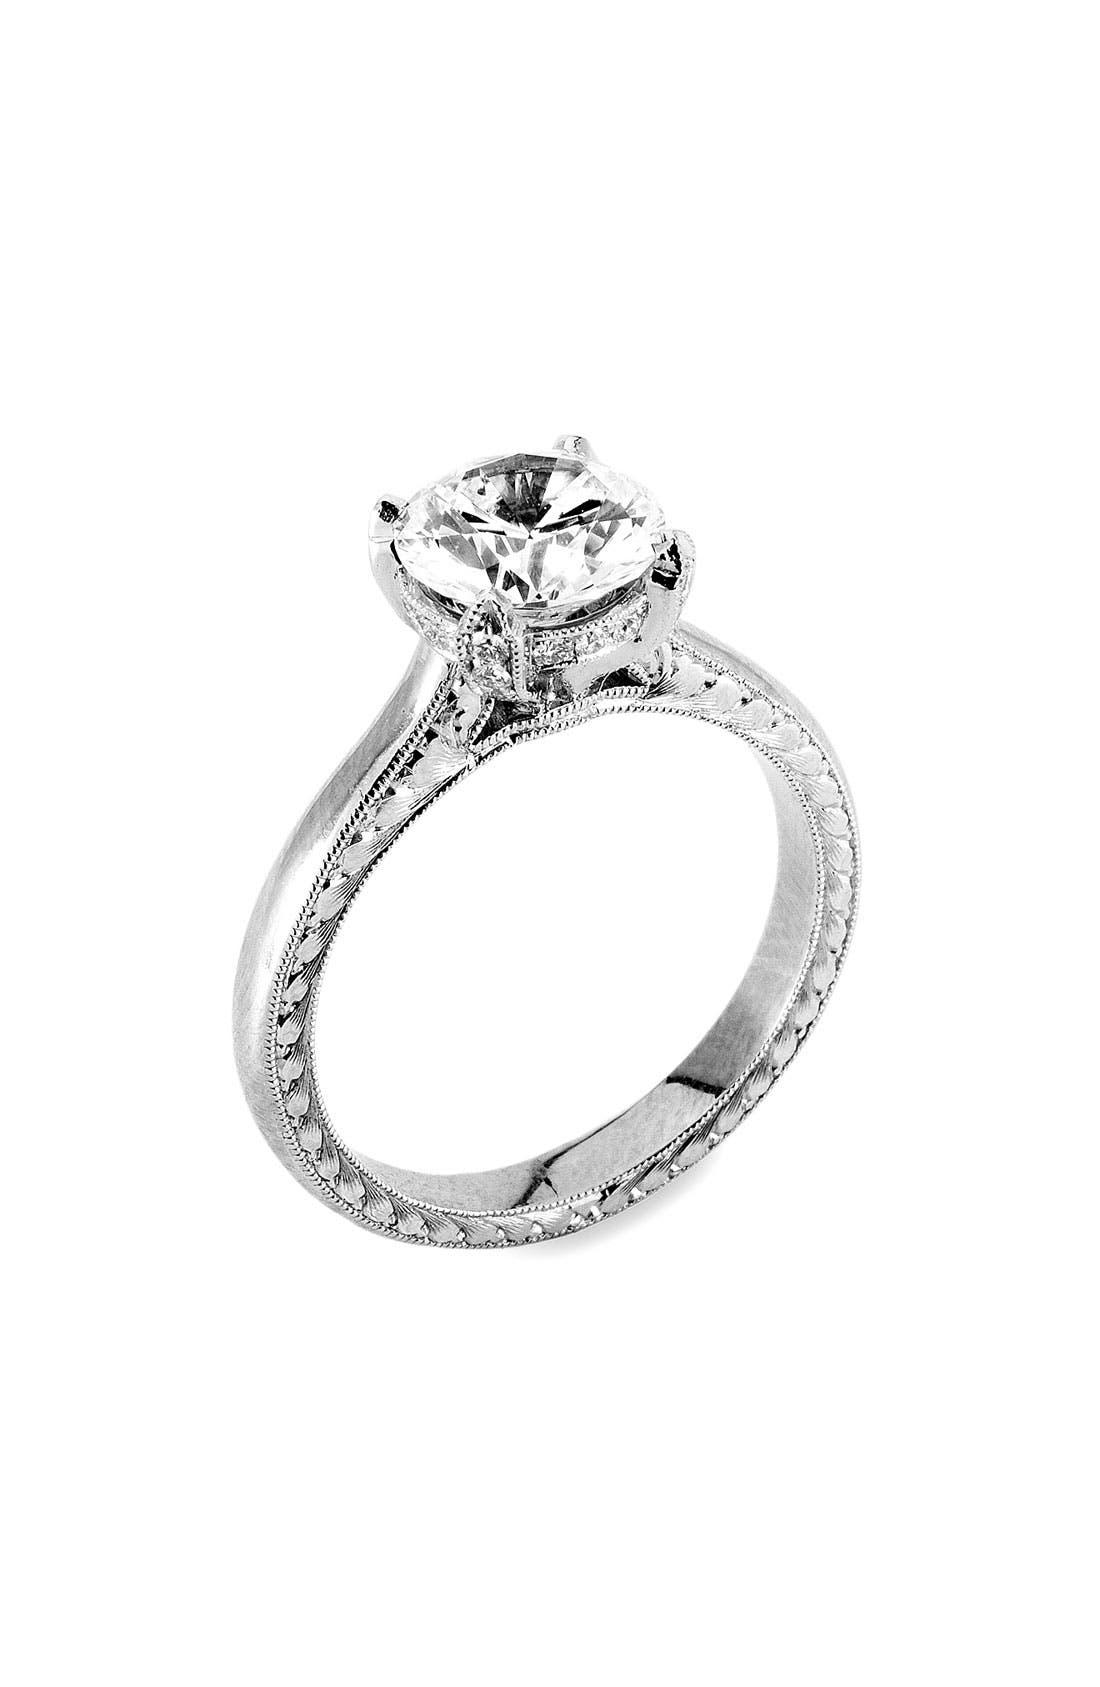 Alternate Image 1 Selected - Jack Kelége Platinum & Diamond Setting Ring